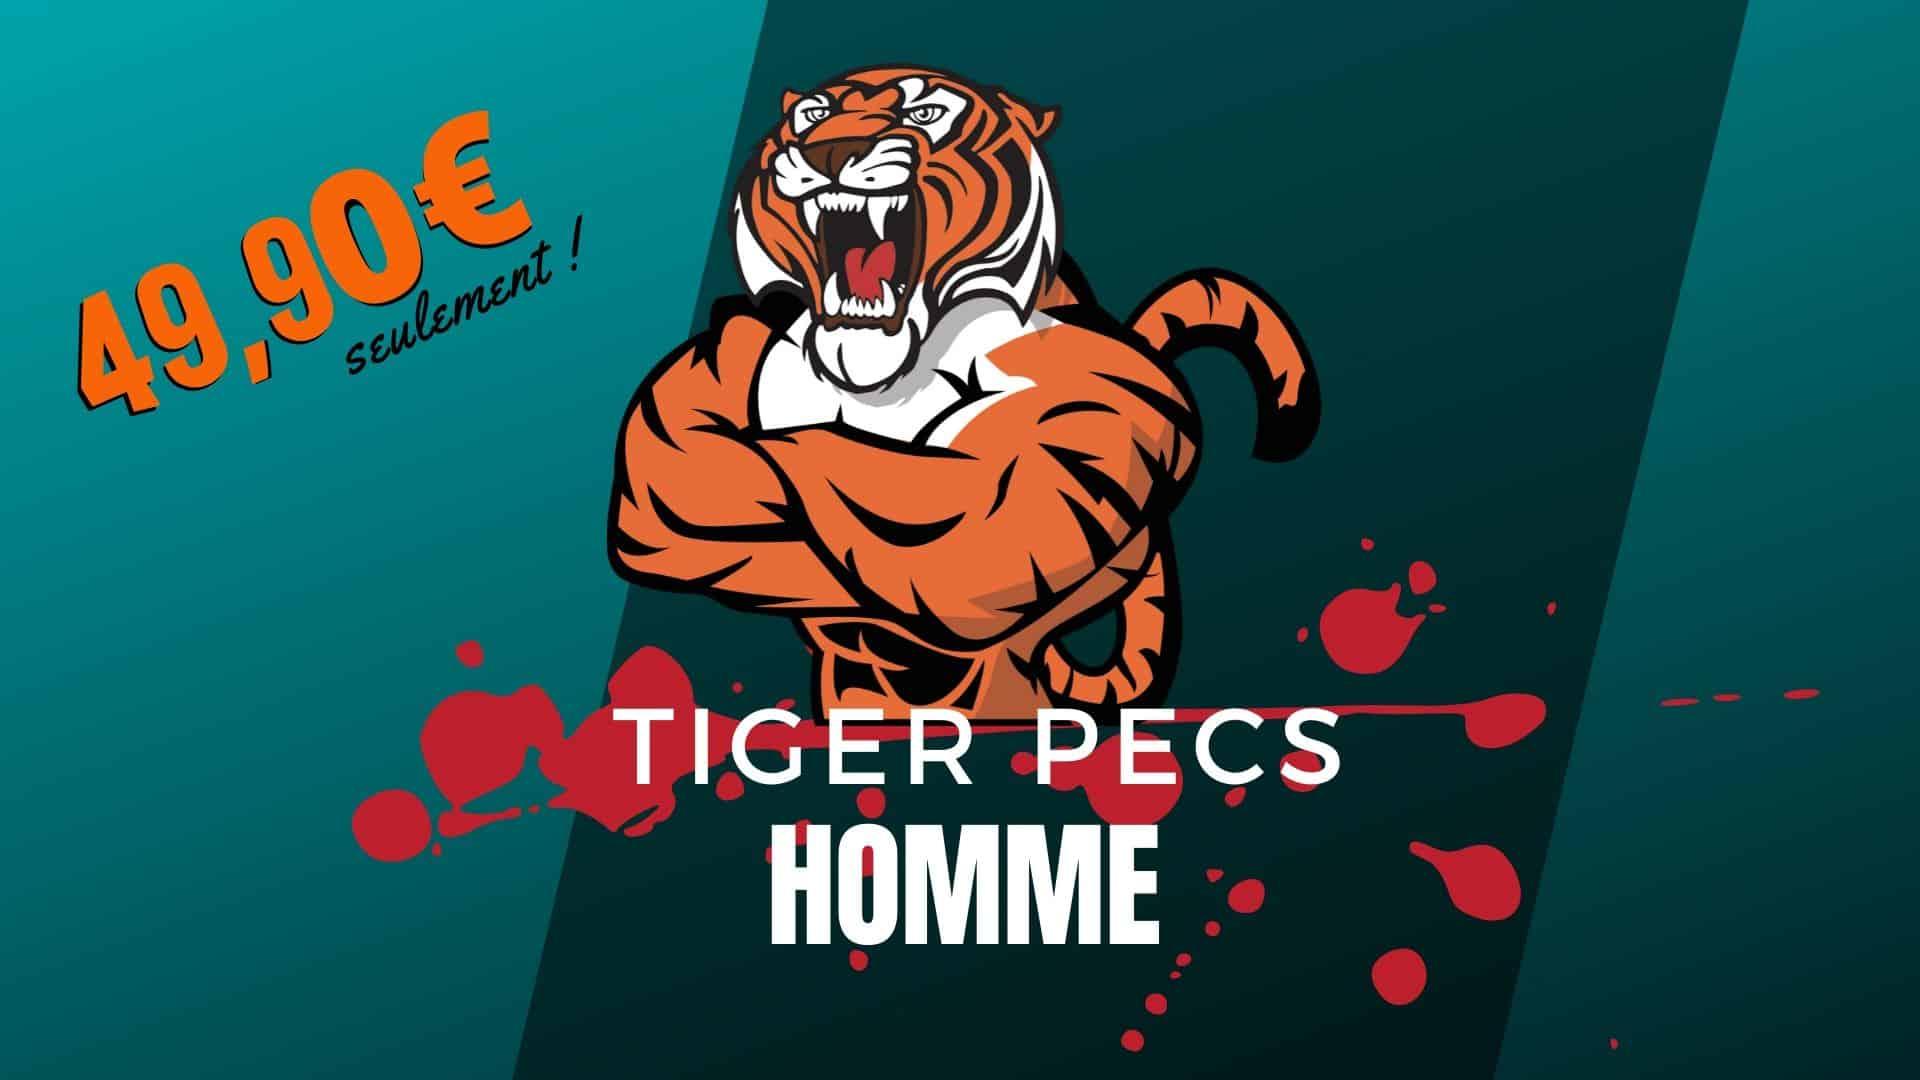 tigerpecs programme pectoraux